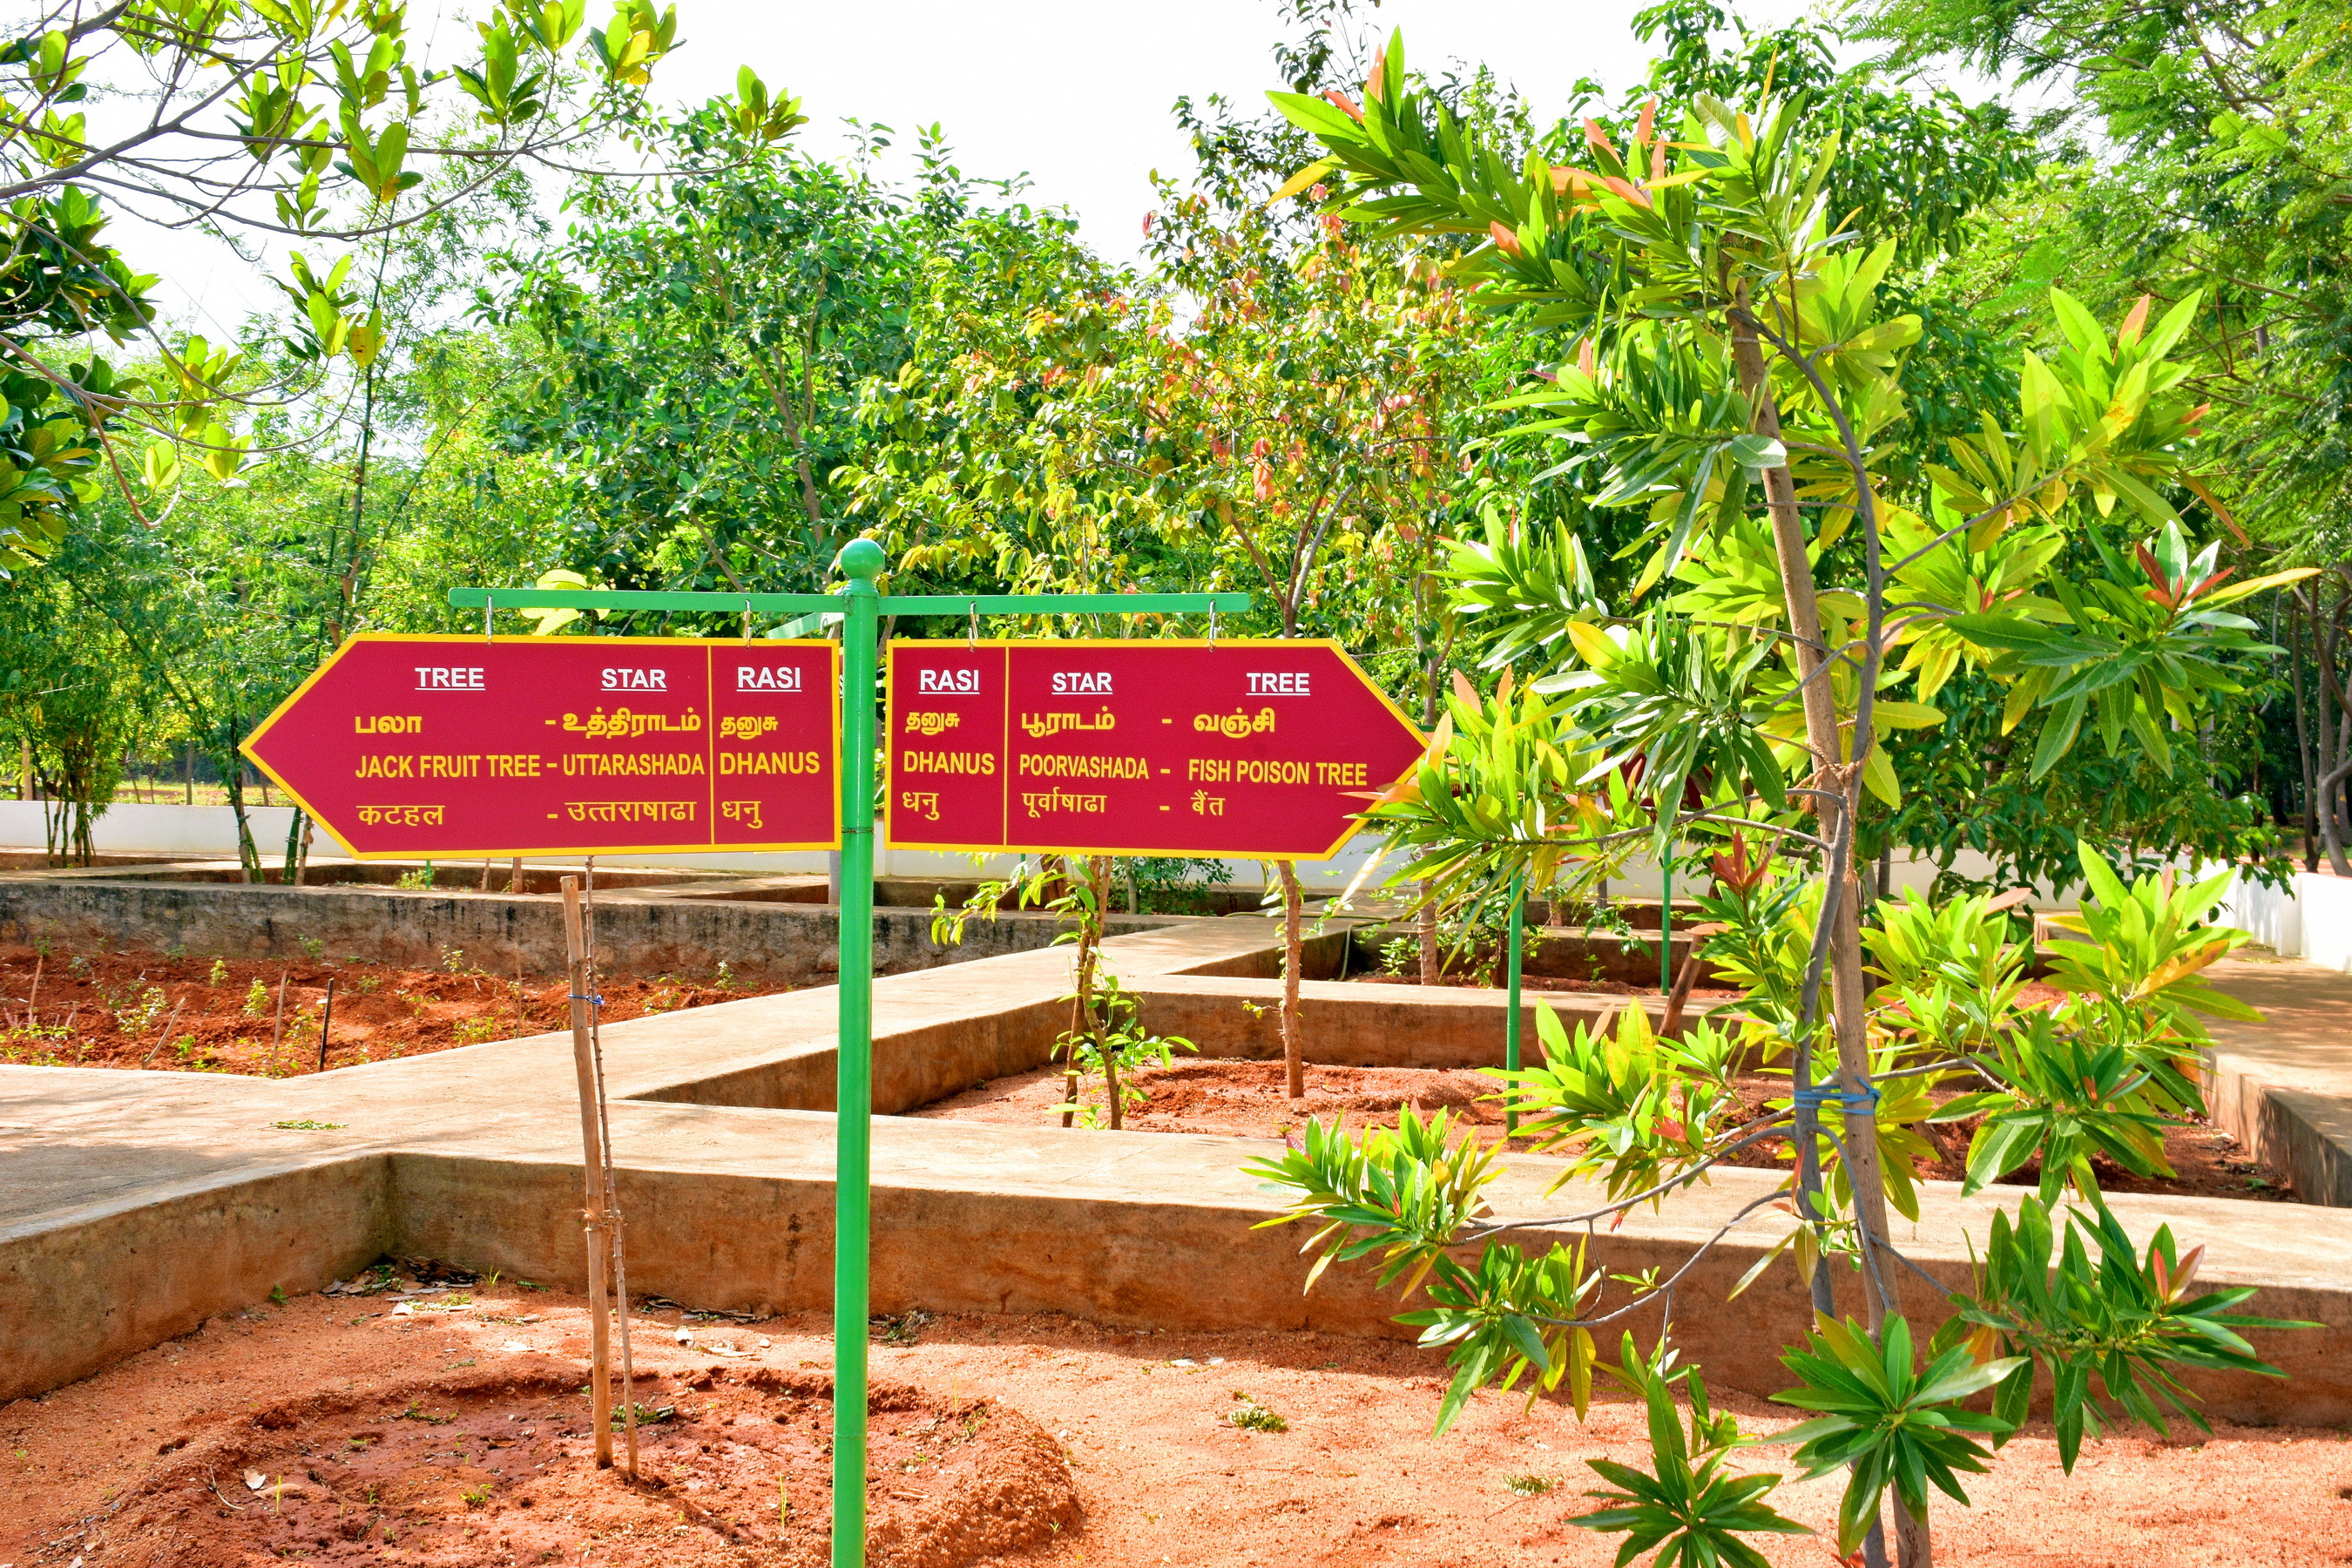 Nakshatra Vanam (Star Forest)